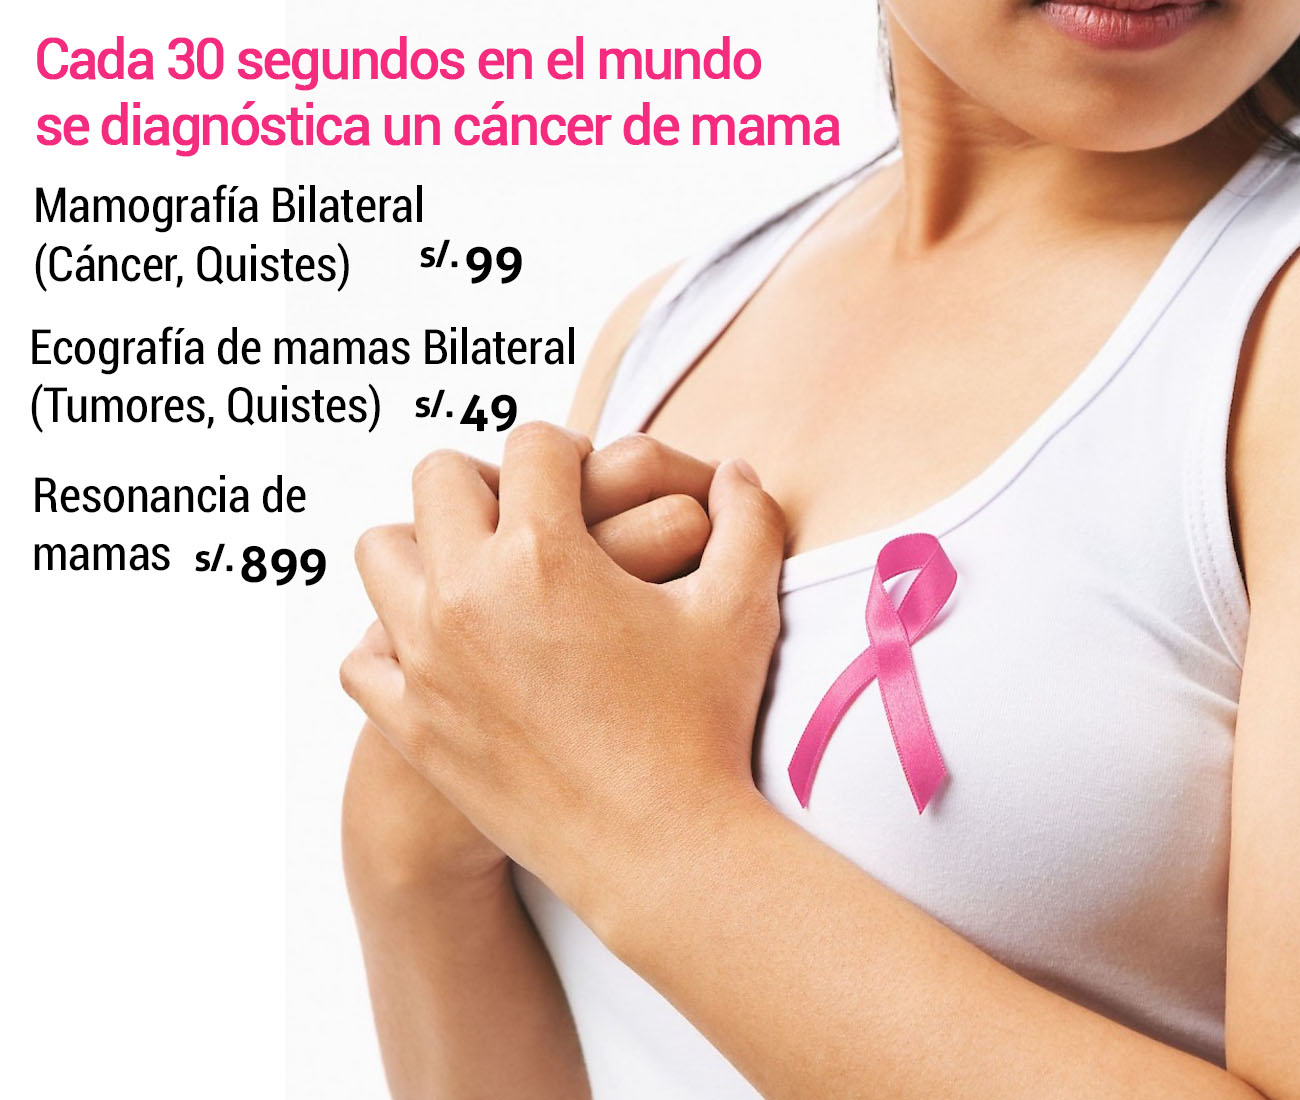 Examen de mamografía bilateral, cáncer de mama